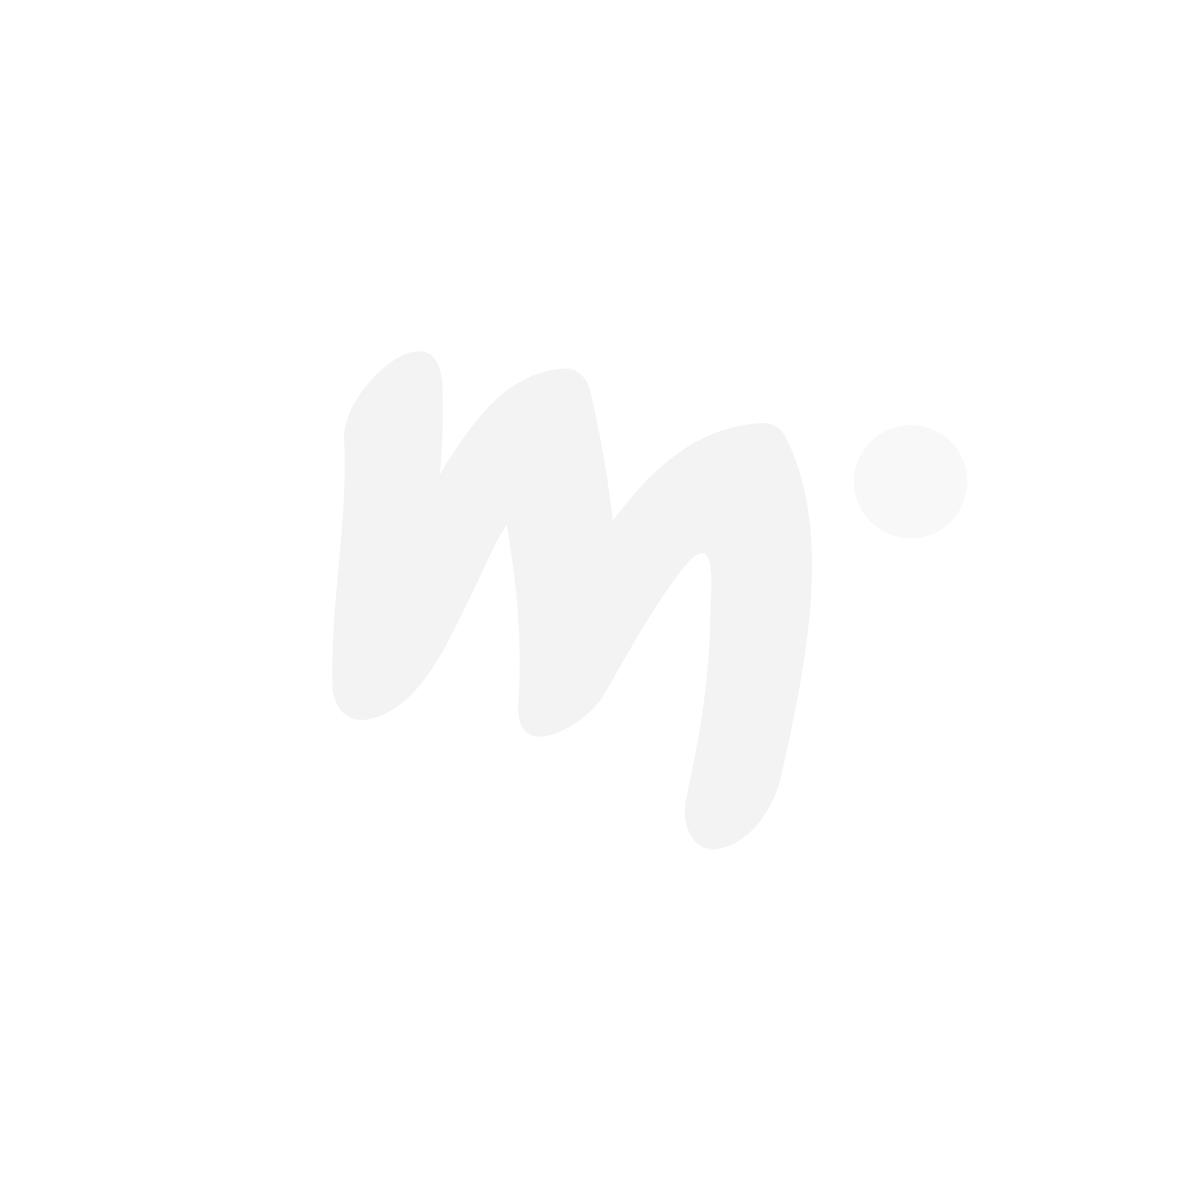 Moomin Enni Sweatshirt Rose Tree gold